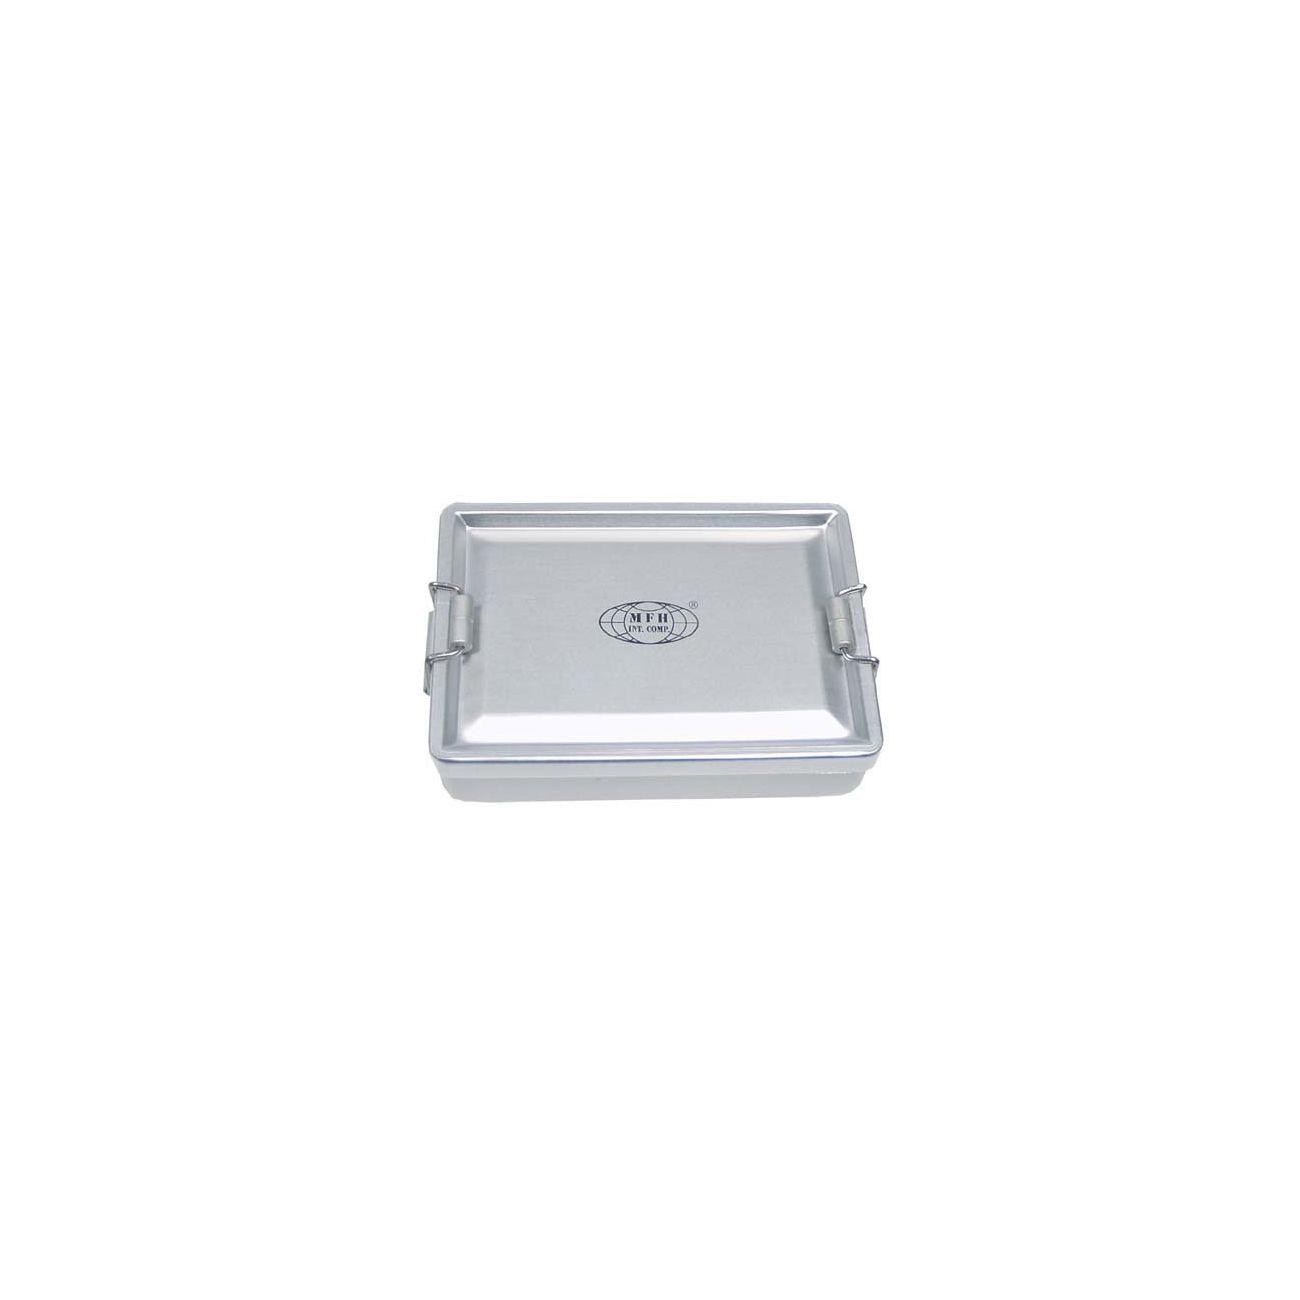 mfh alu box 13 3 x 9 2 x 3 4 cm wasserdicht kotte zeller. Black Bedroom Furniture Sets. Home Design Ideas